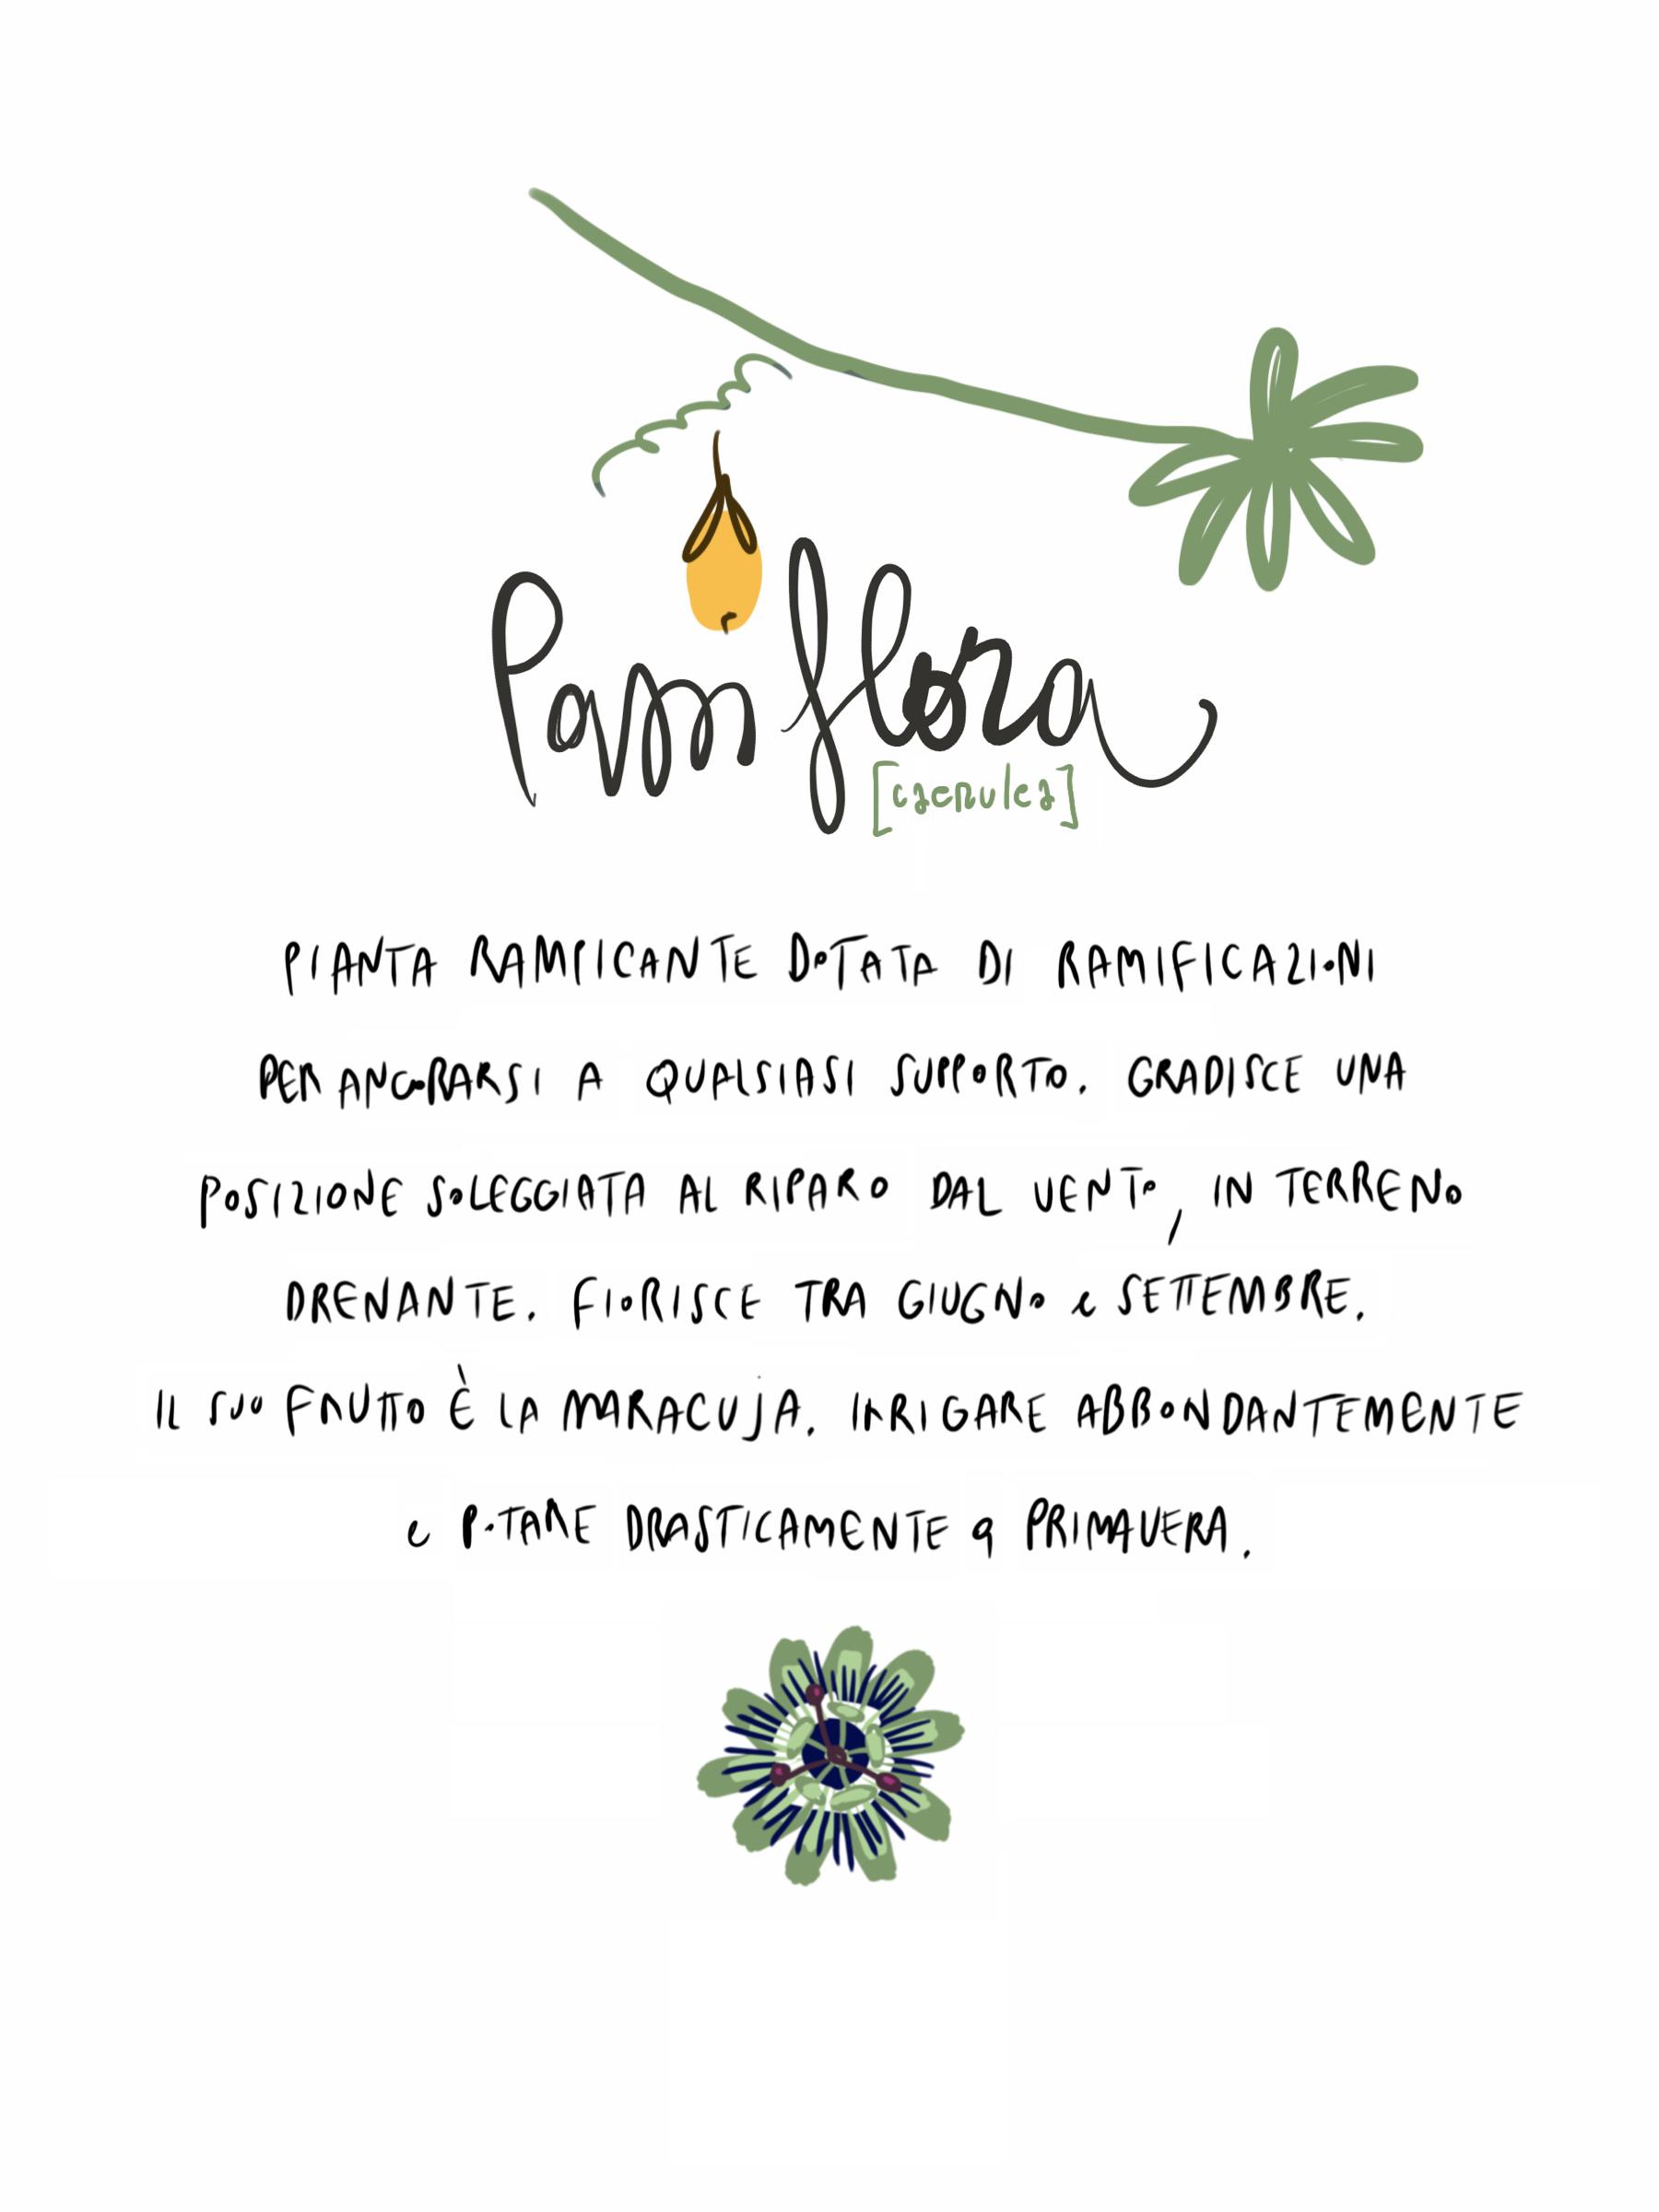 Passiflora flower illustration by Silvana Mariani